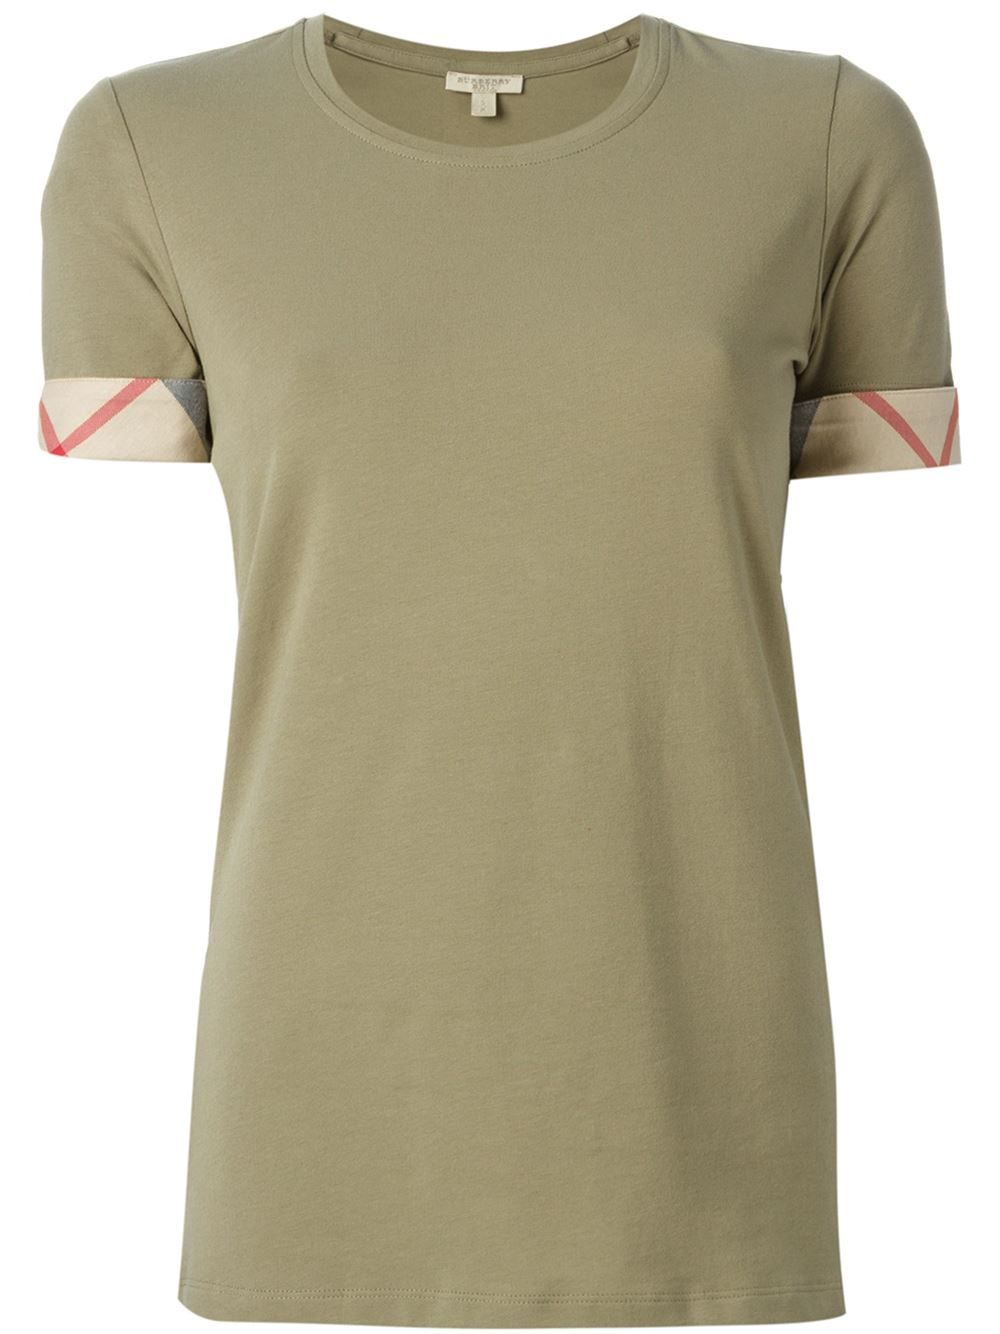 burberry brit slim fit t shirt in green lyst. Black Bedroom Furniture Sets. Home Design Ideas